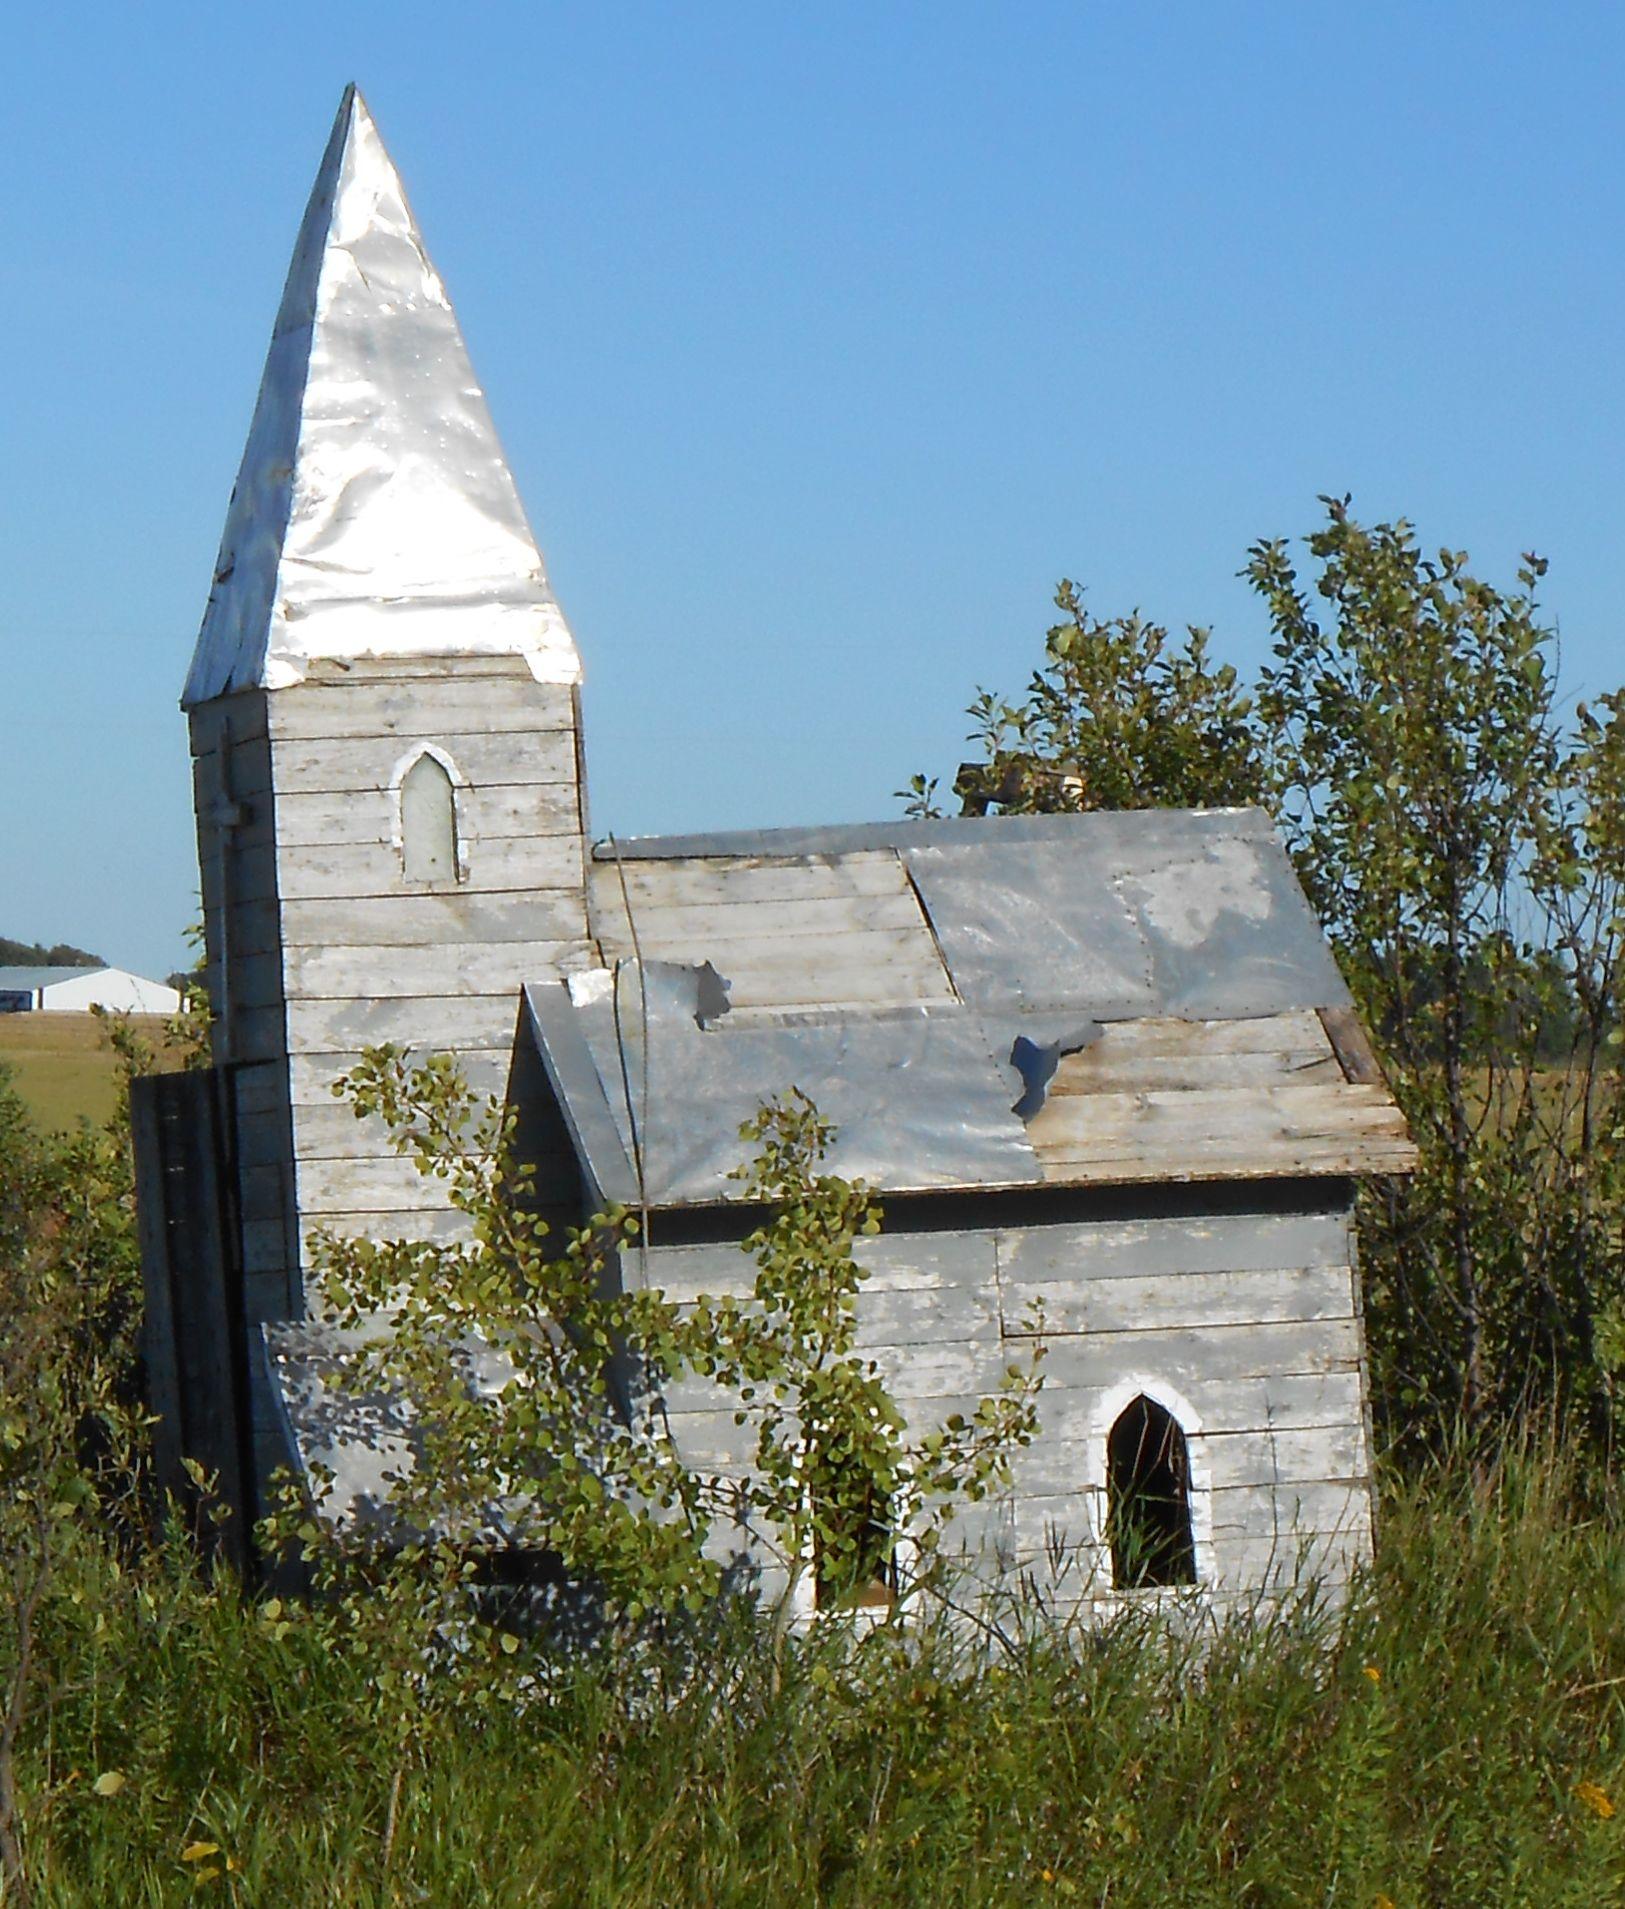 802. Miniature Village, Dilapidated Church, near Badger, Roseau County, Minnesota - Photo by Eunice Korczak